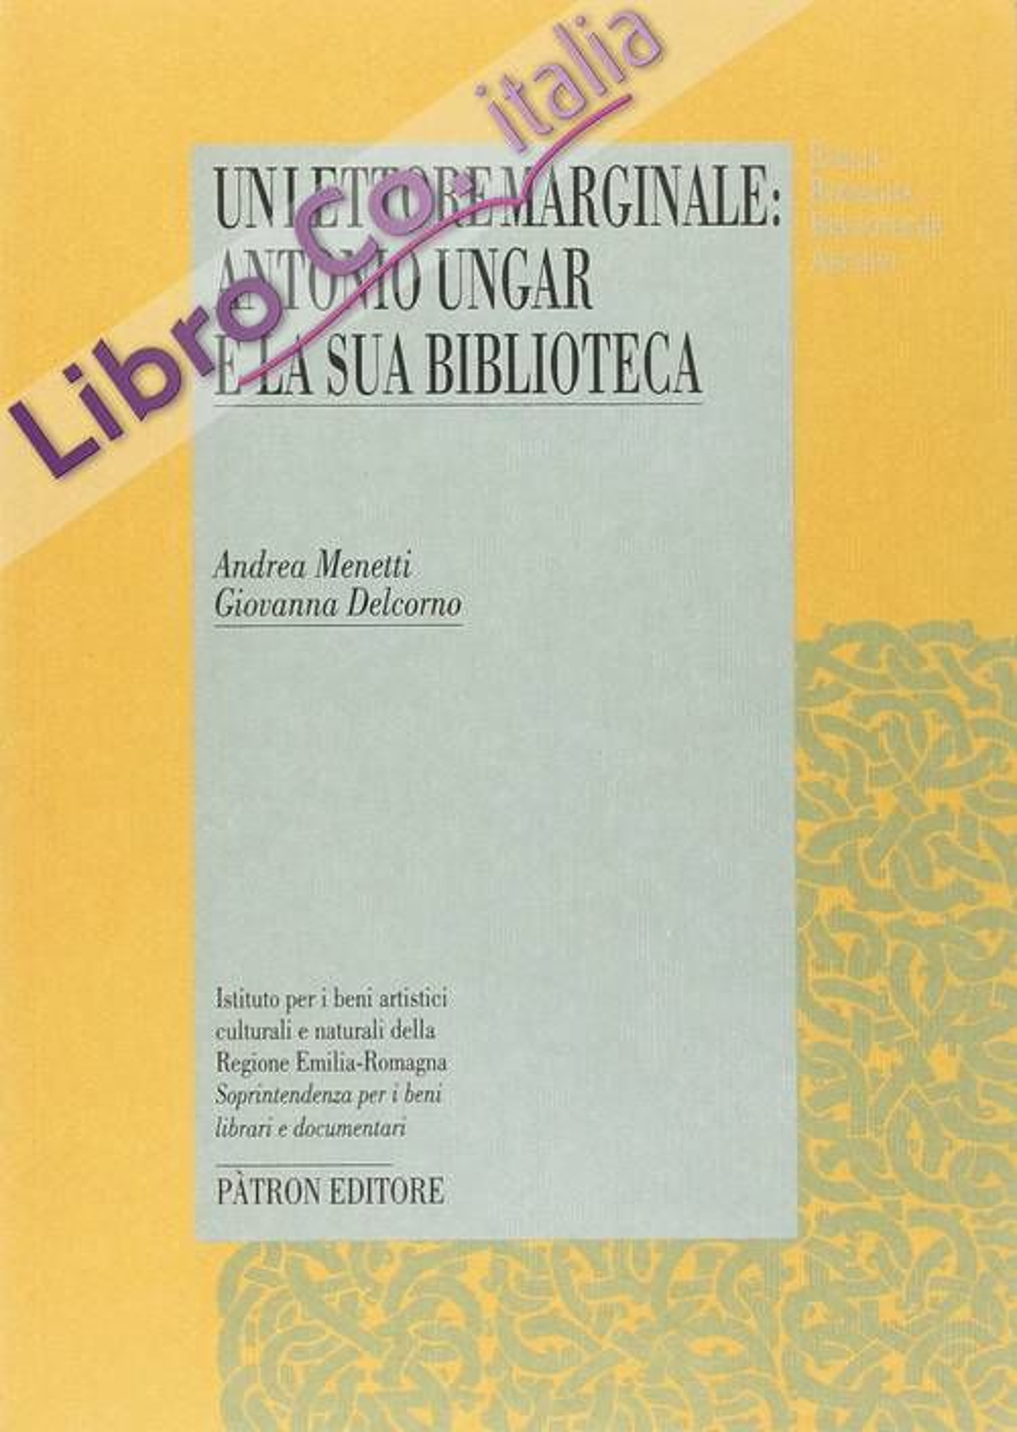 Un lettore marginale: Antonio Ungar e la sua biblioteca